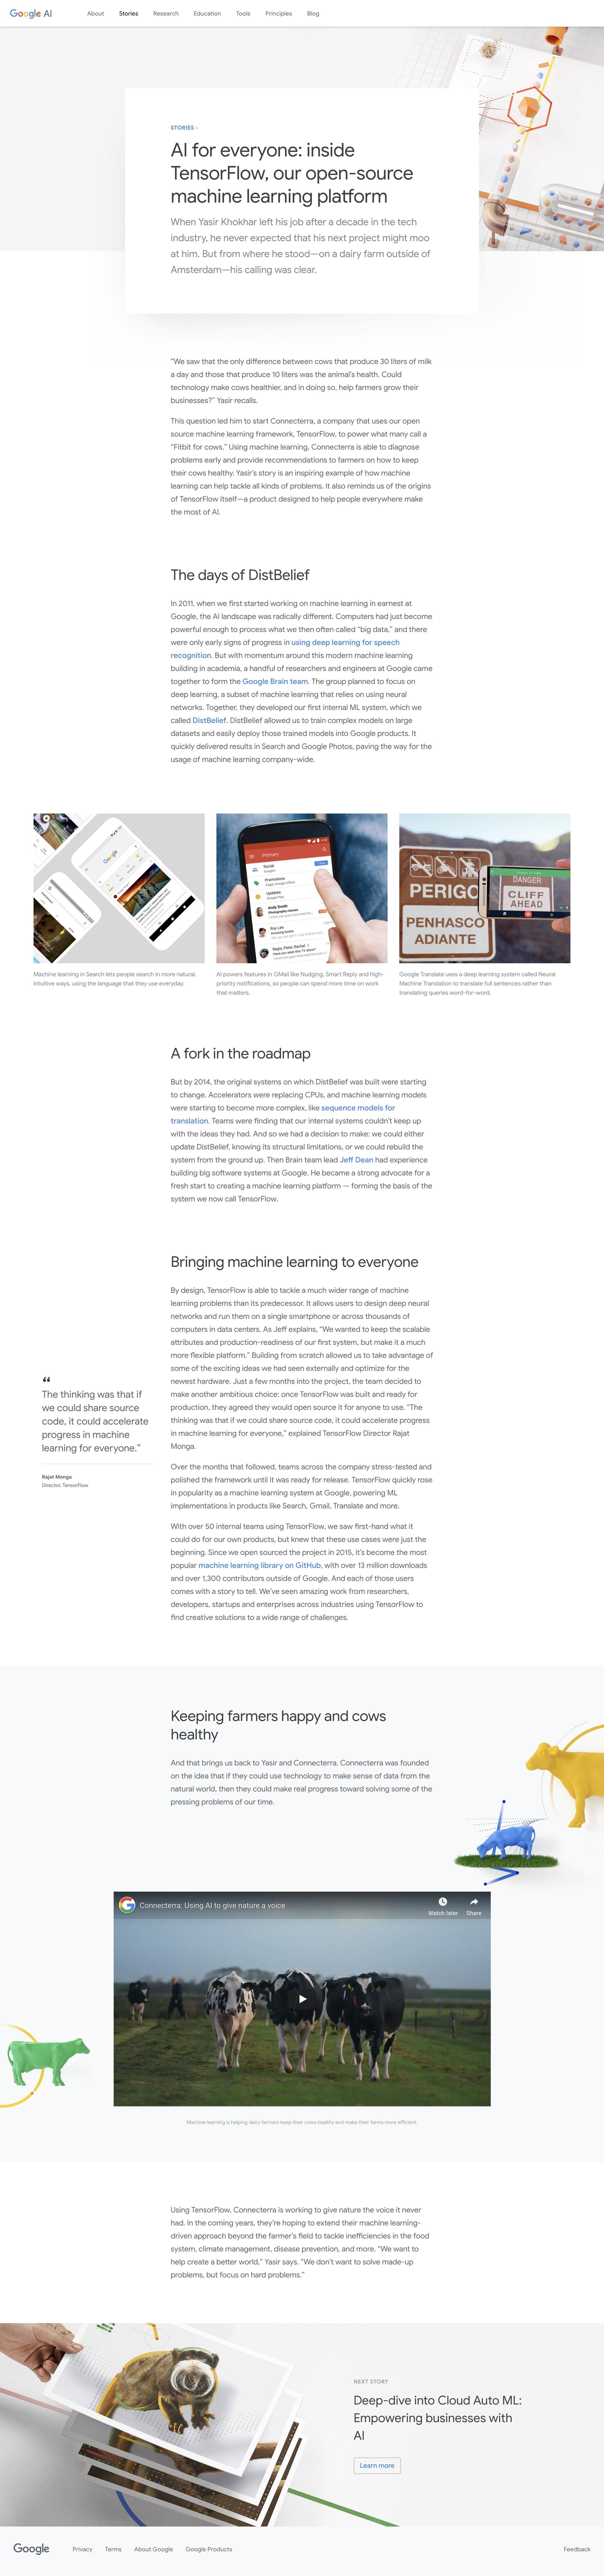 screencapture-ai-google-stories-tensorflow-2019-03-10-12_11_54.jpg